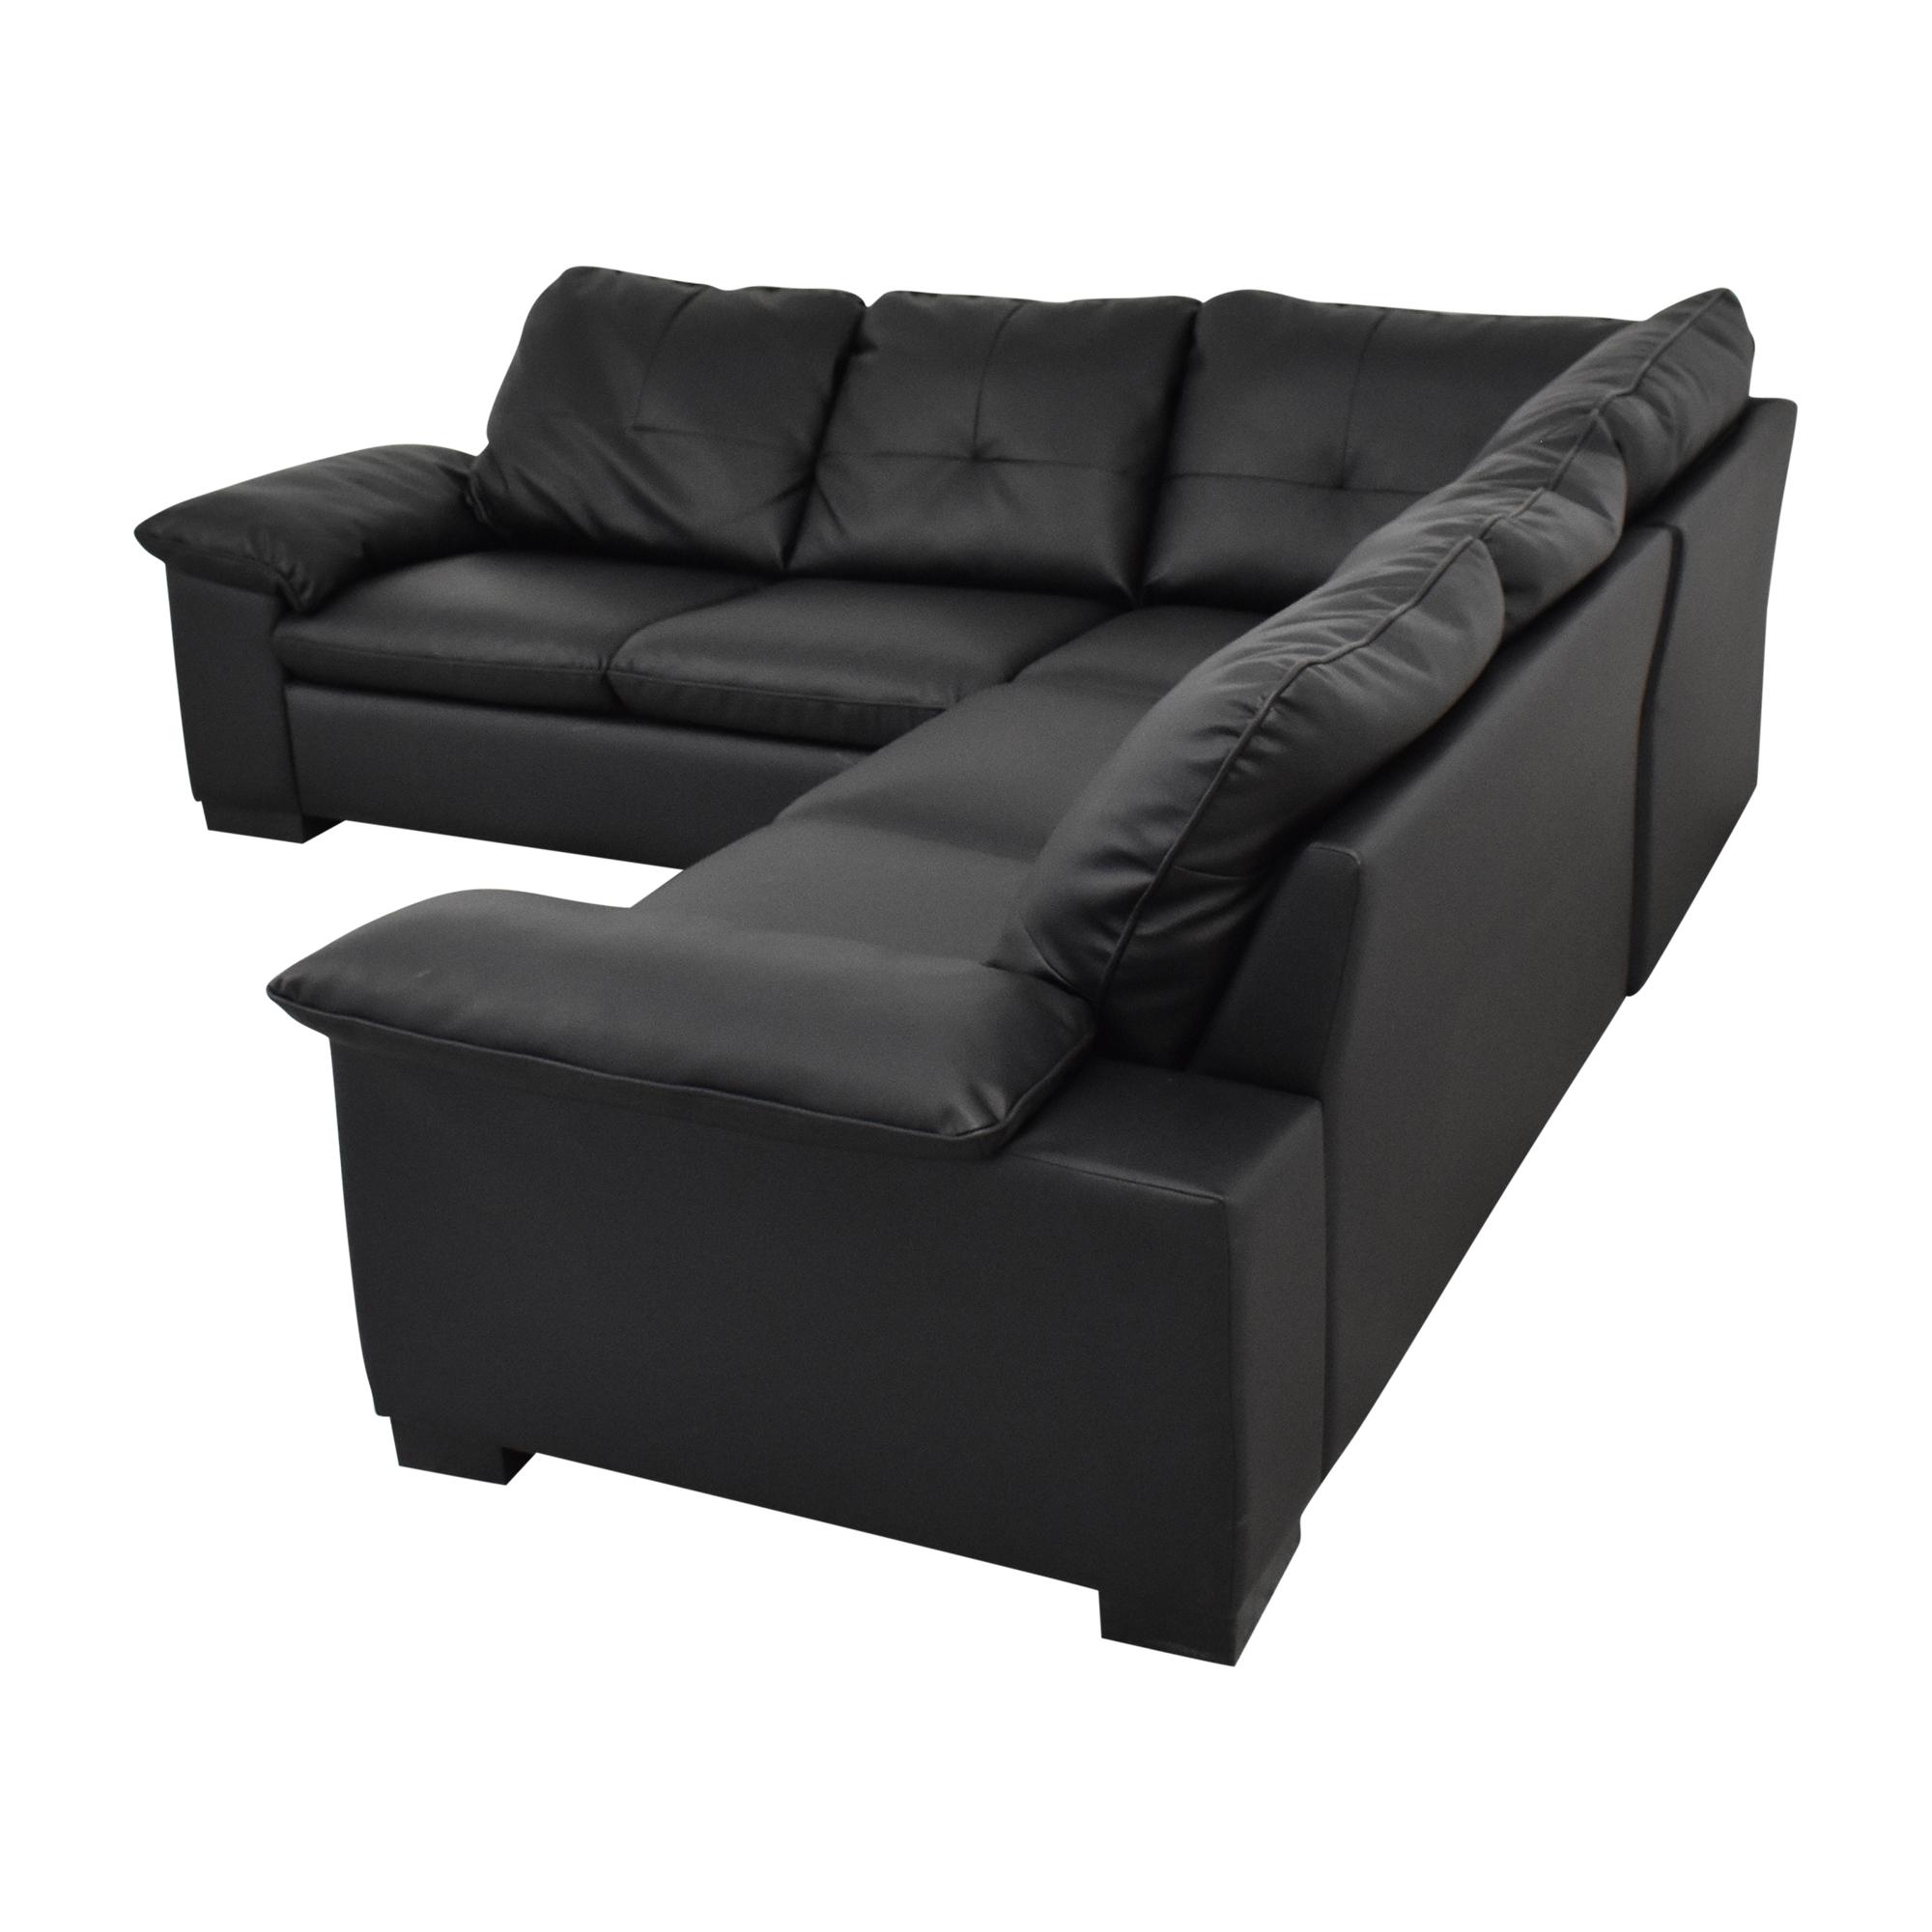 21 Off Ikea Ikea Dagstorp Corner Sofa Sofas